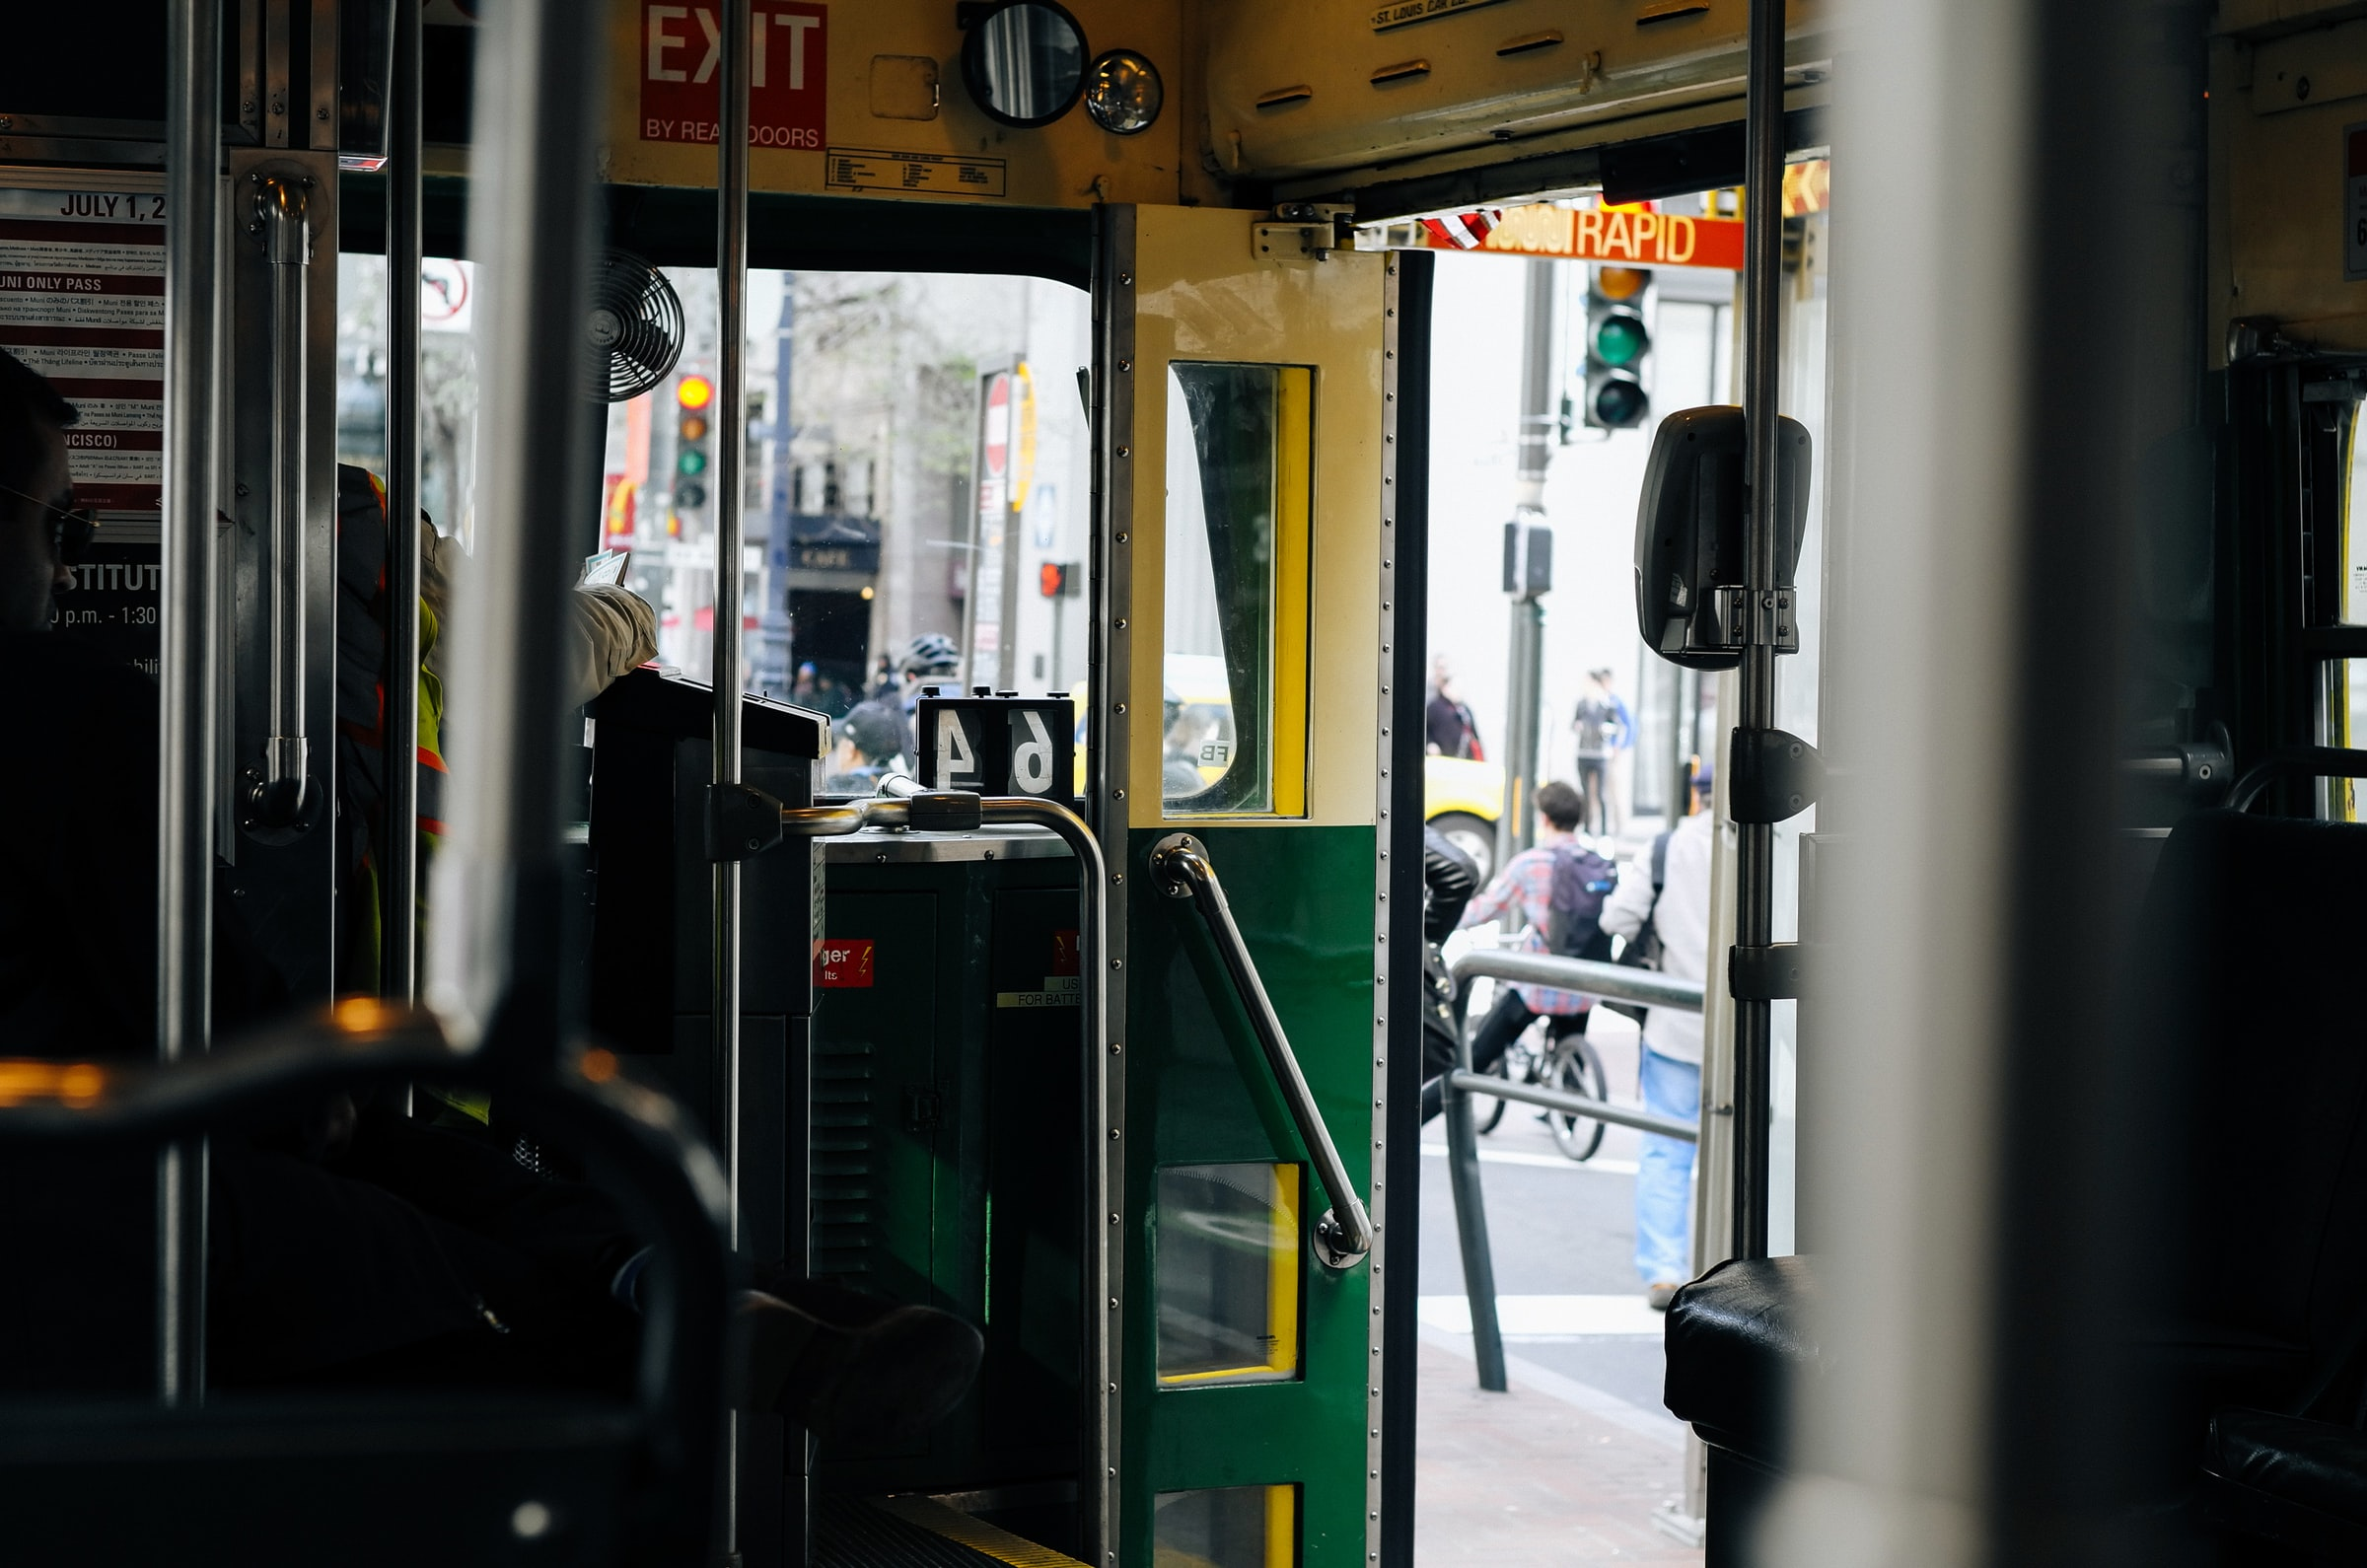 San Francisco public transportation